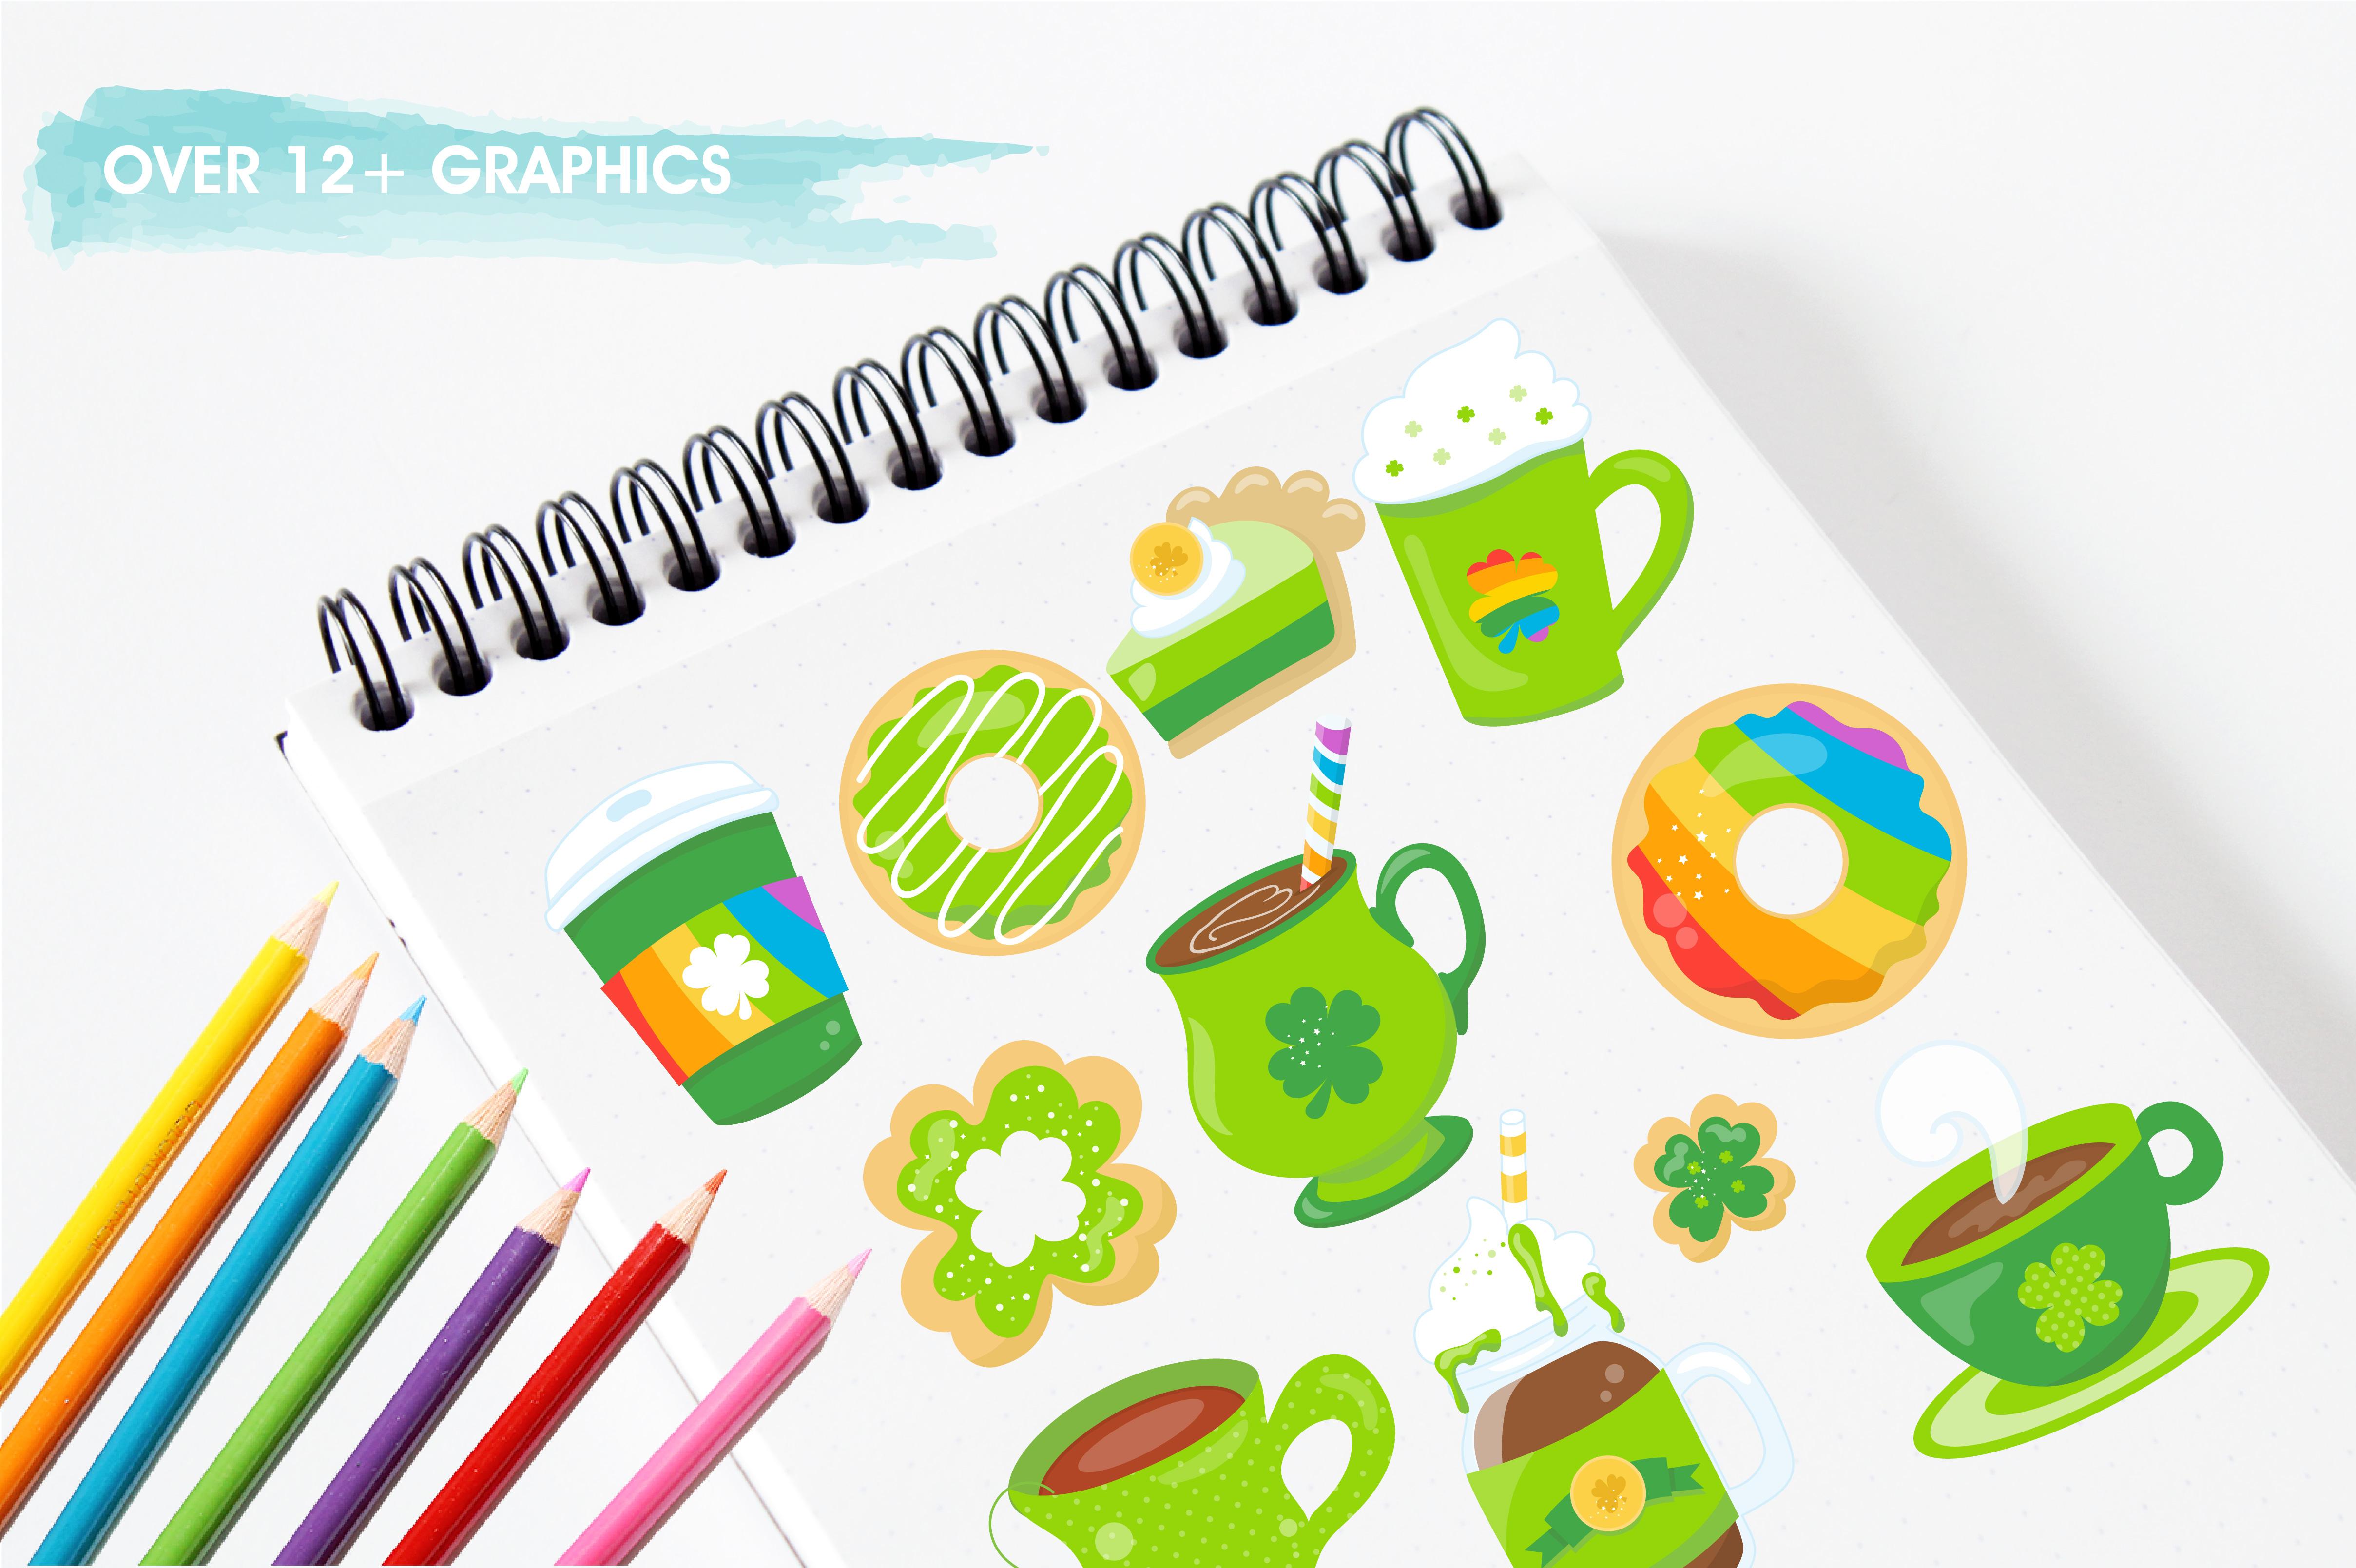 Irish coffee graphics and illustrations example image 3